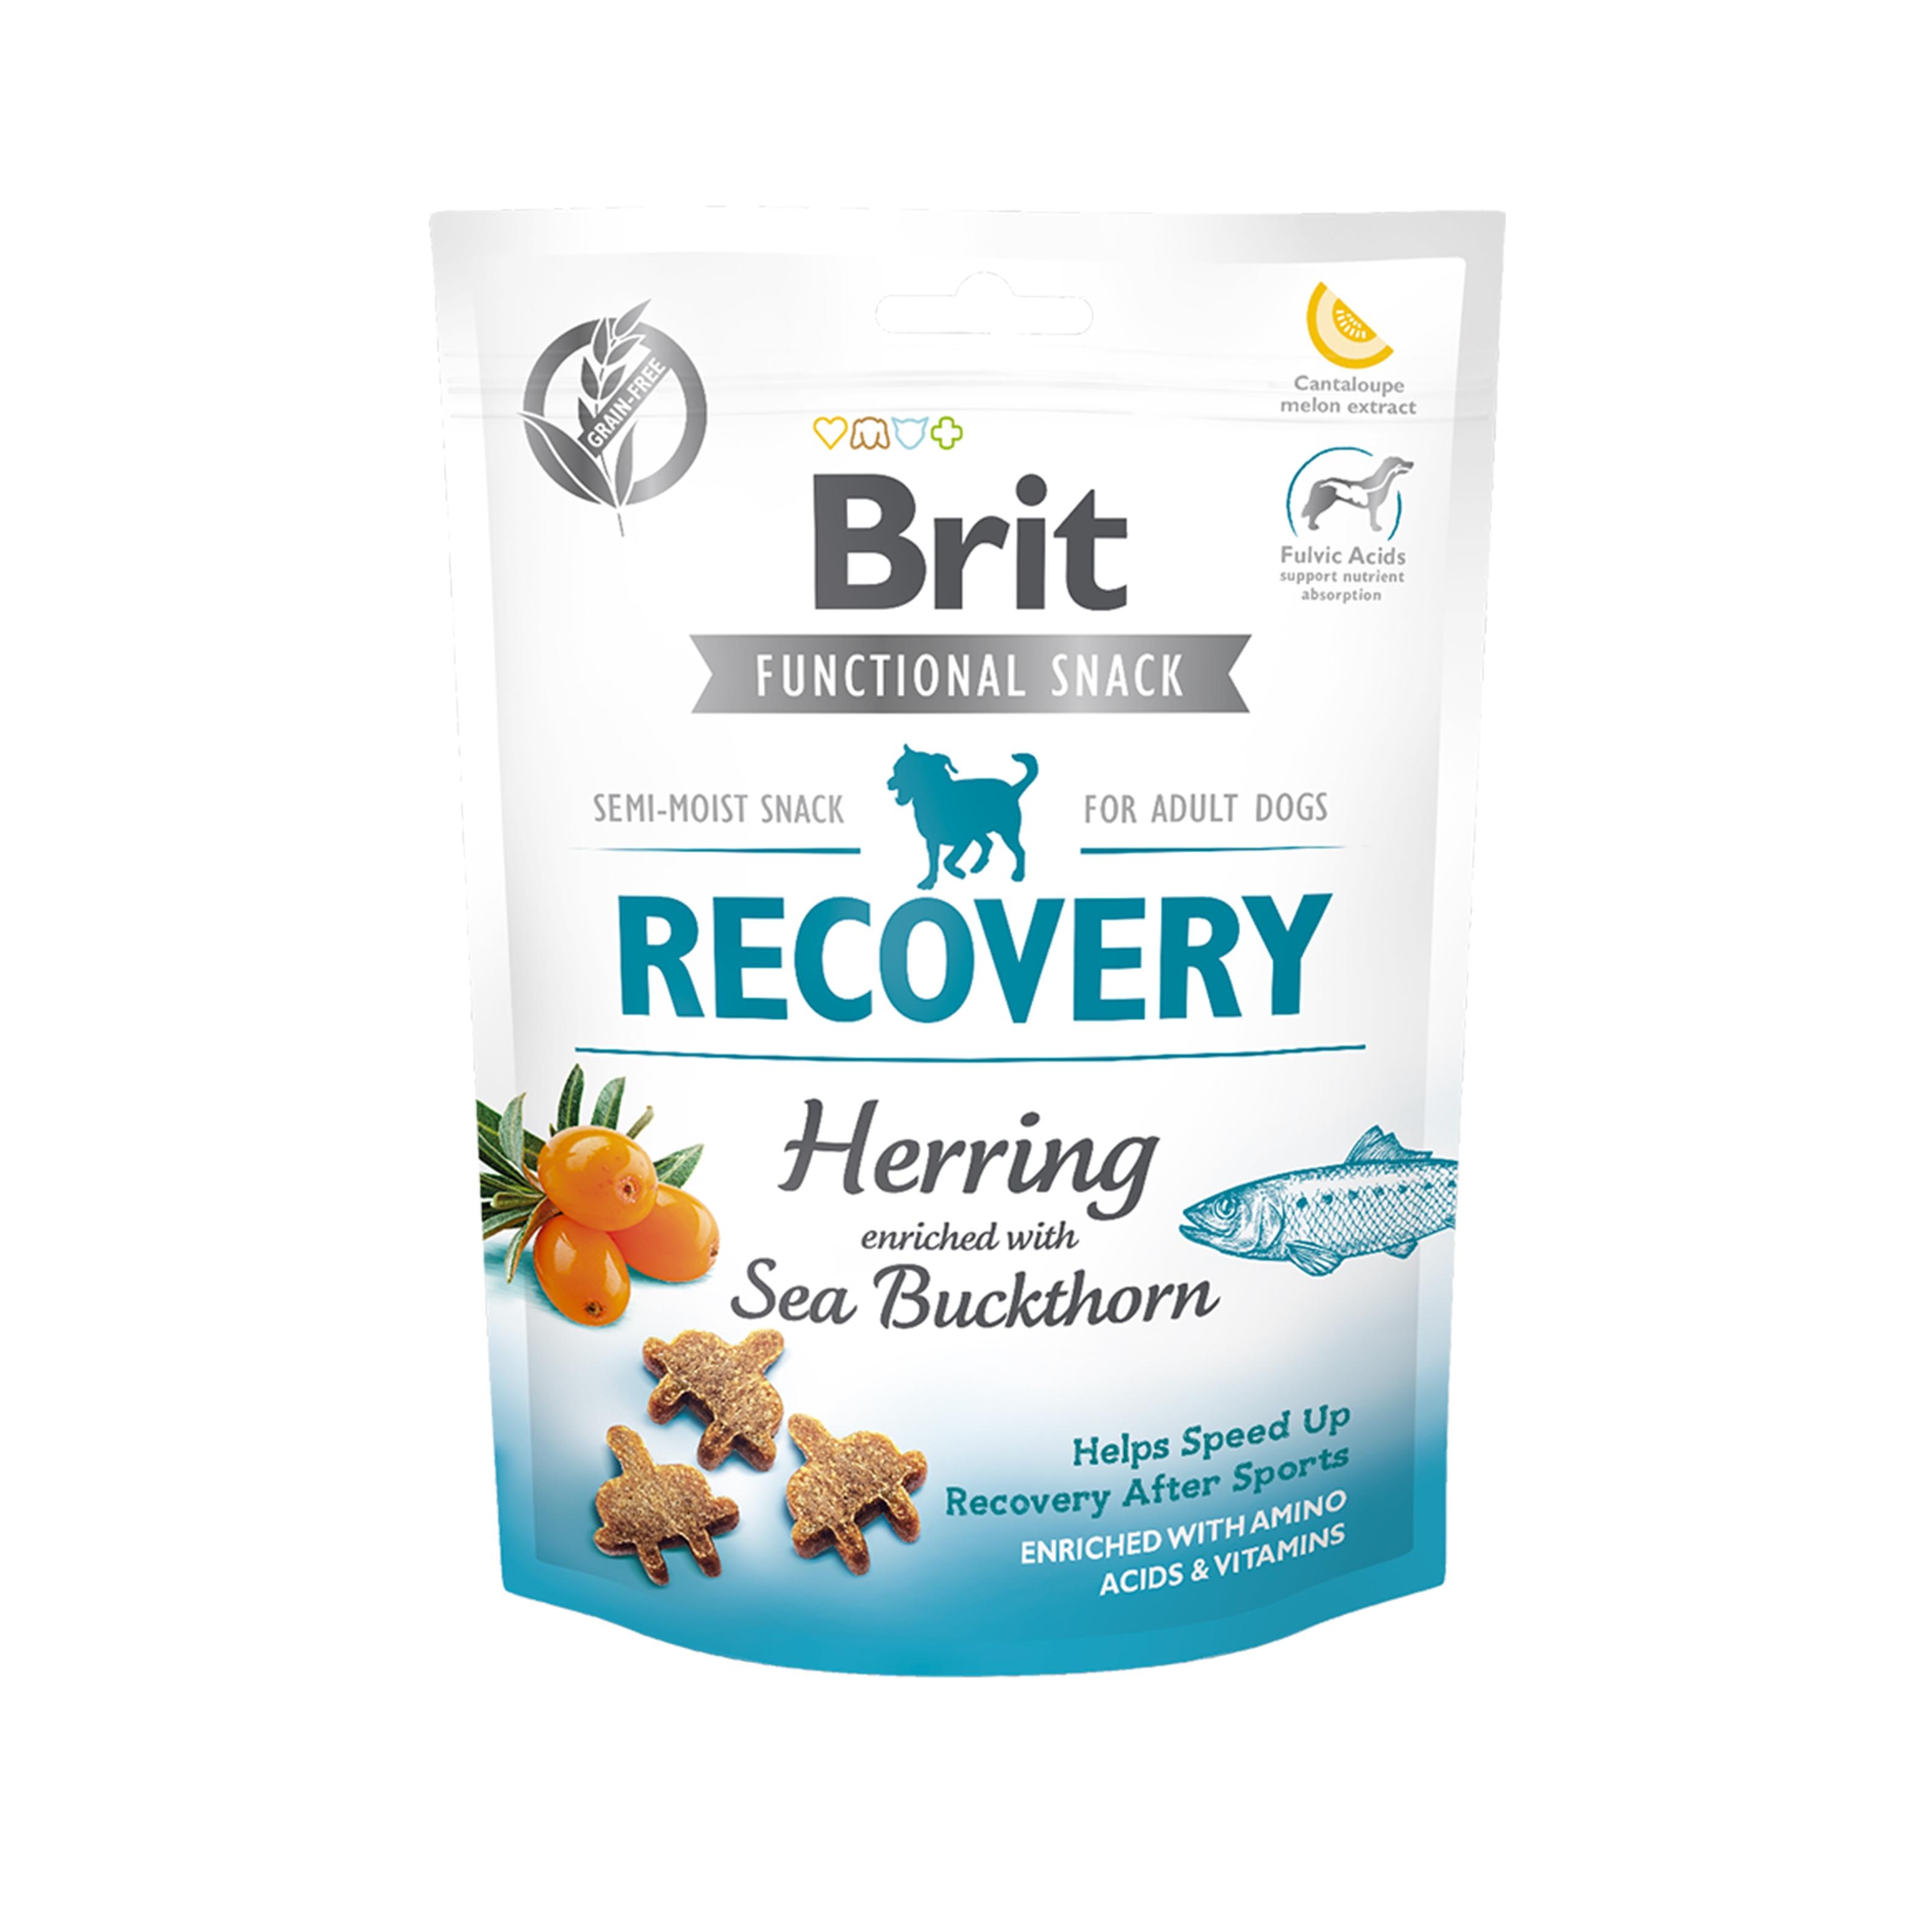 https://d2ac76g66dj6h3.cloudfront.net/media/catalog/product/b/r/brit_care_dog_snack_recovery_herring_150_g.jpg nou